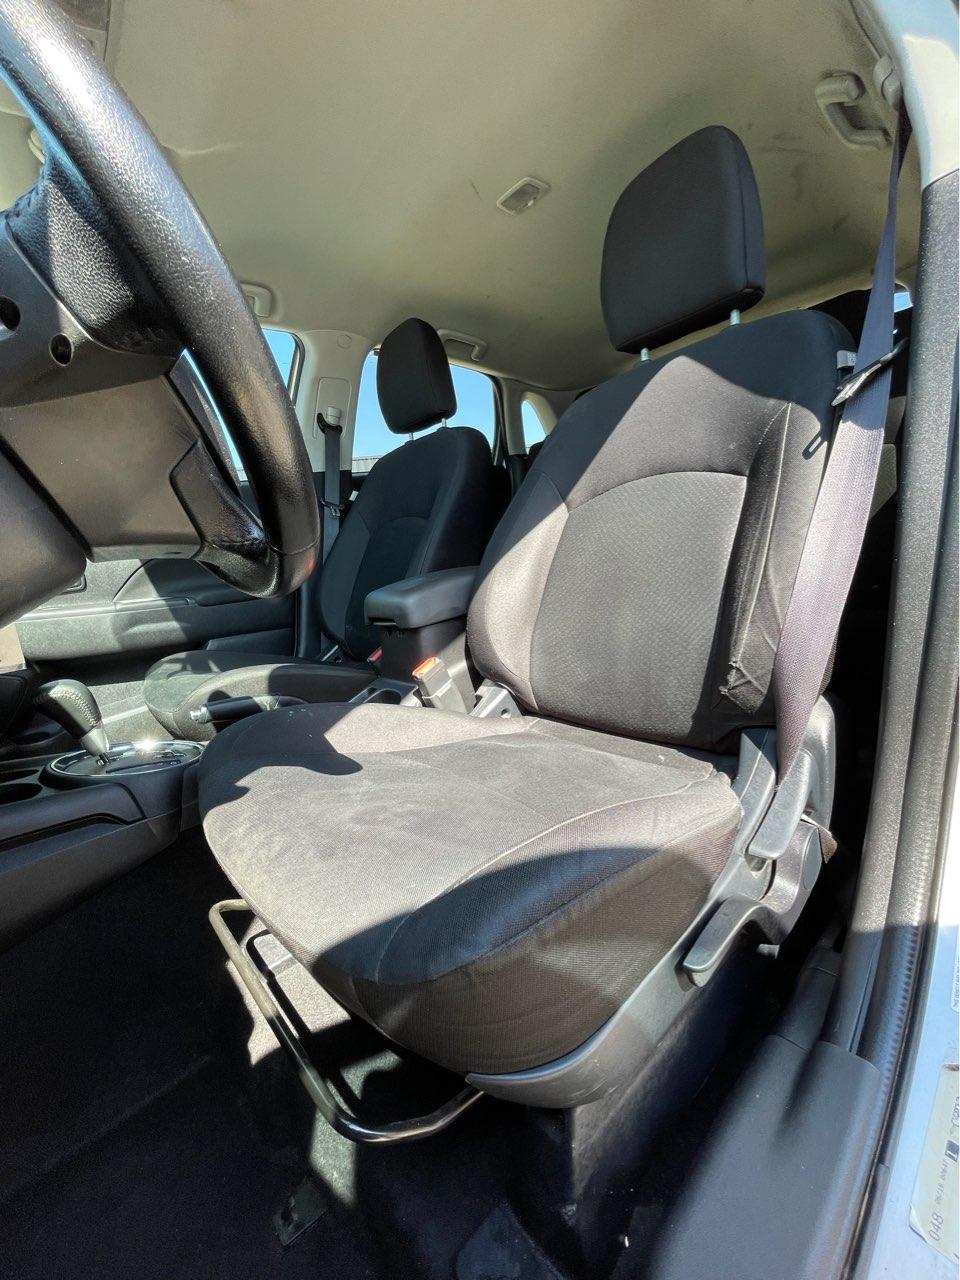 used vehicle - SUV MITSUBISHI OUTLANDER SPORT 2015